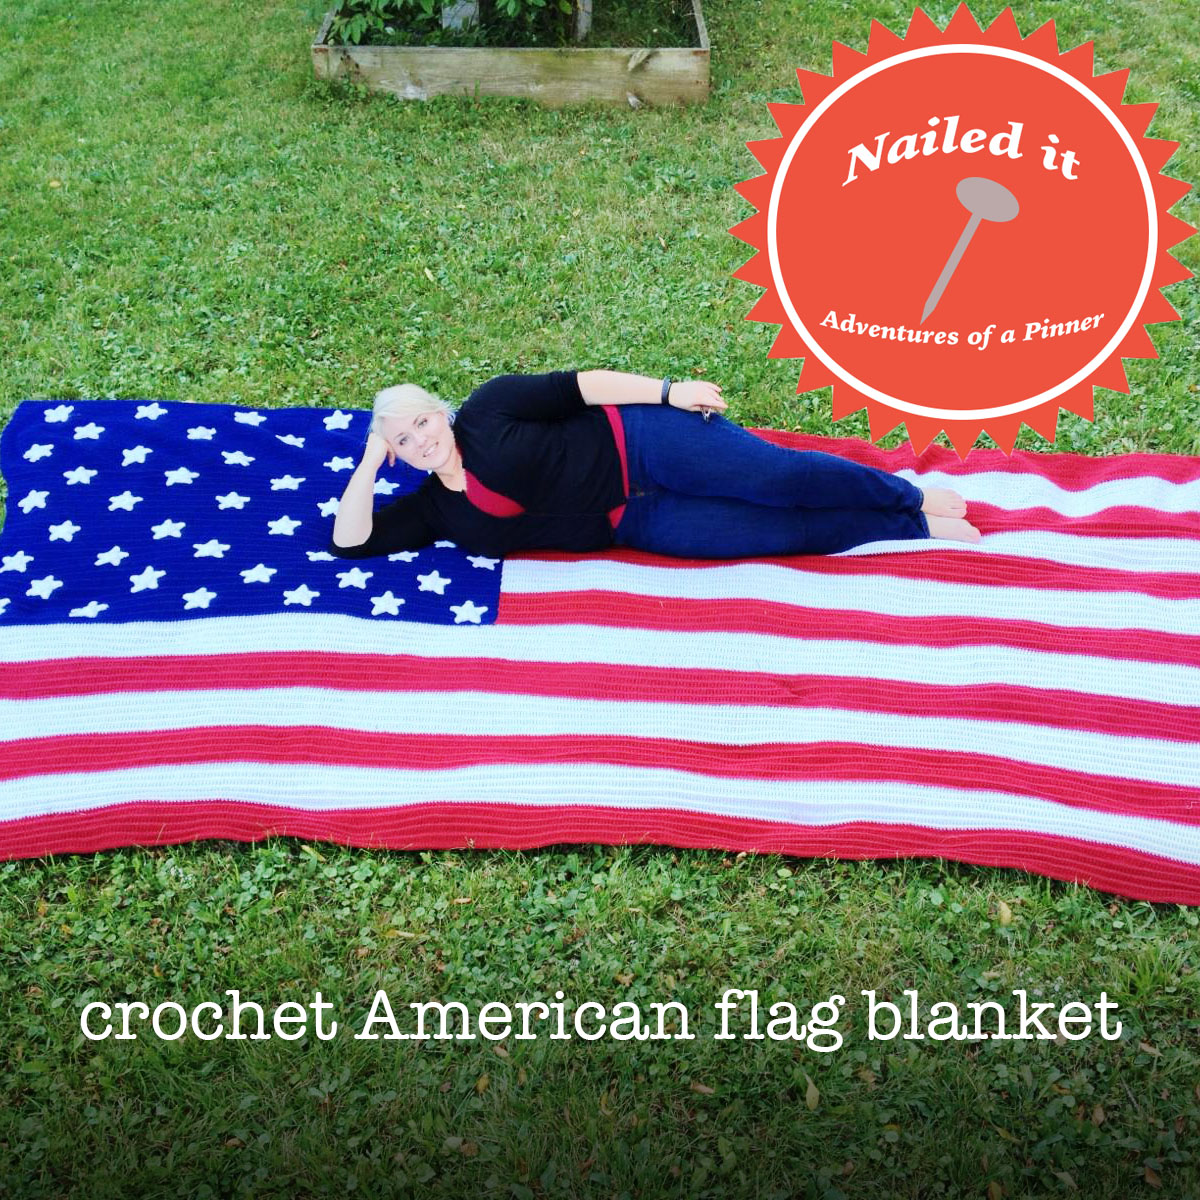 Crochet American Flag Blanket by Adventures of a Pinner Blog